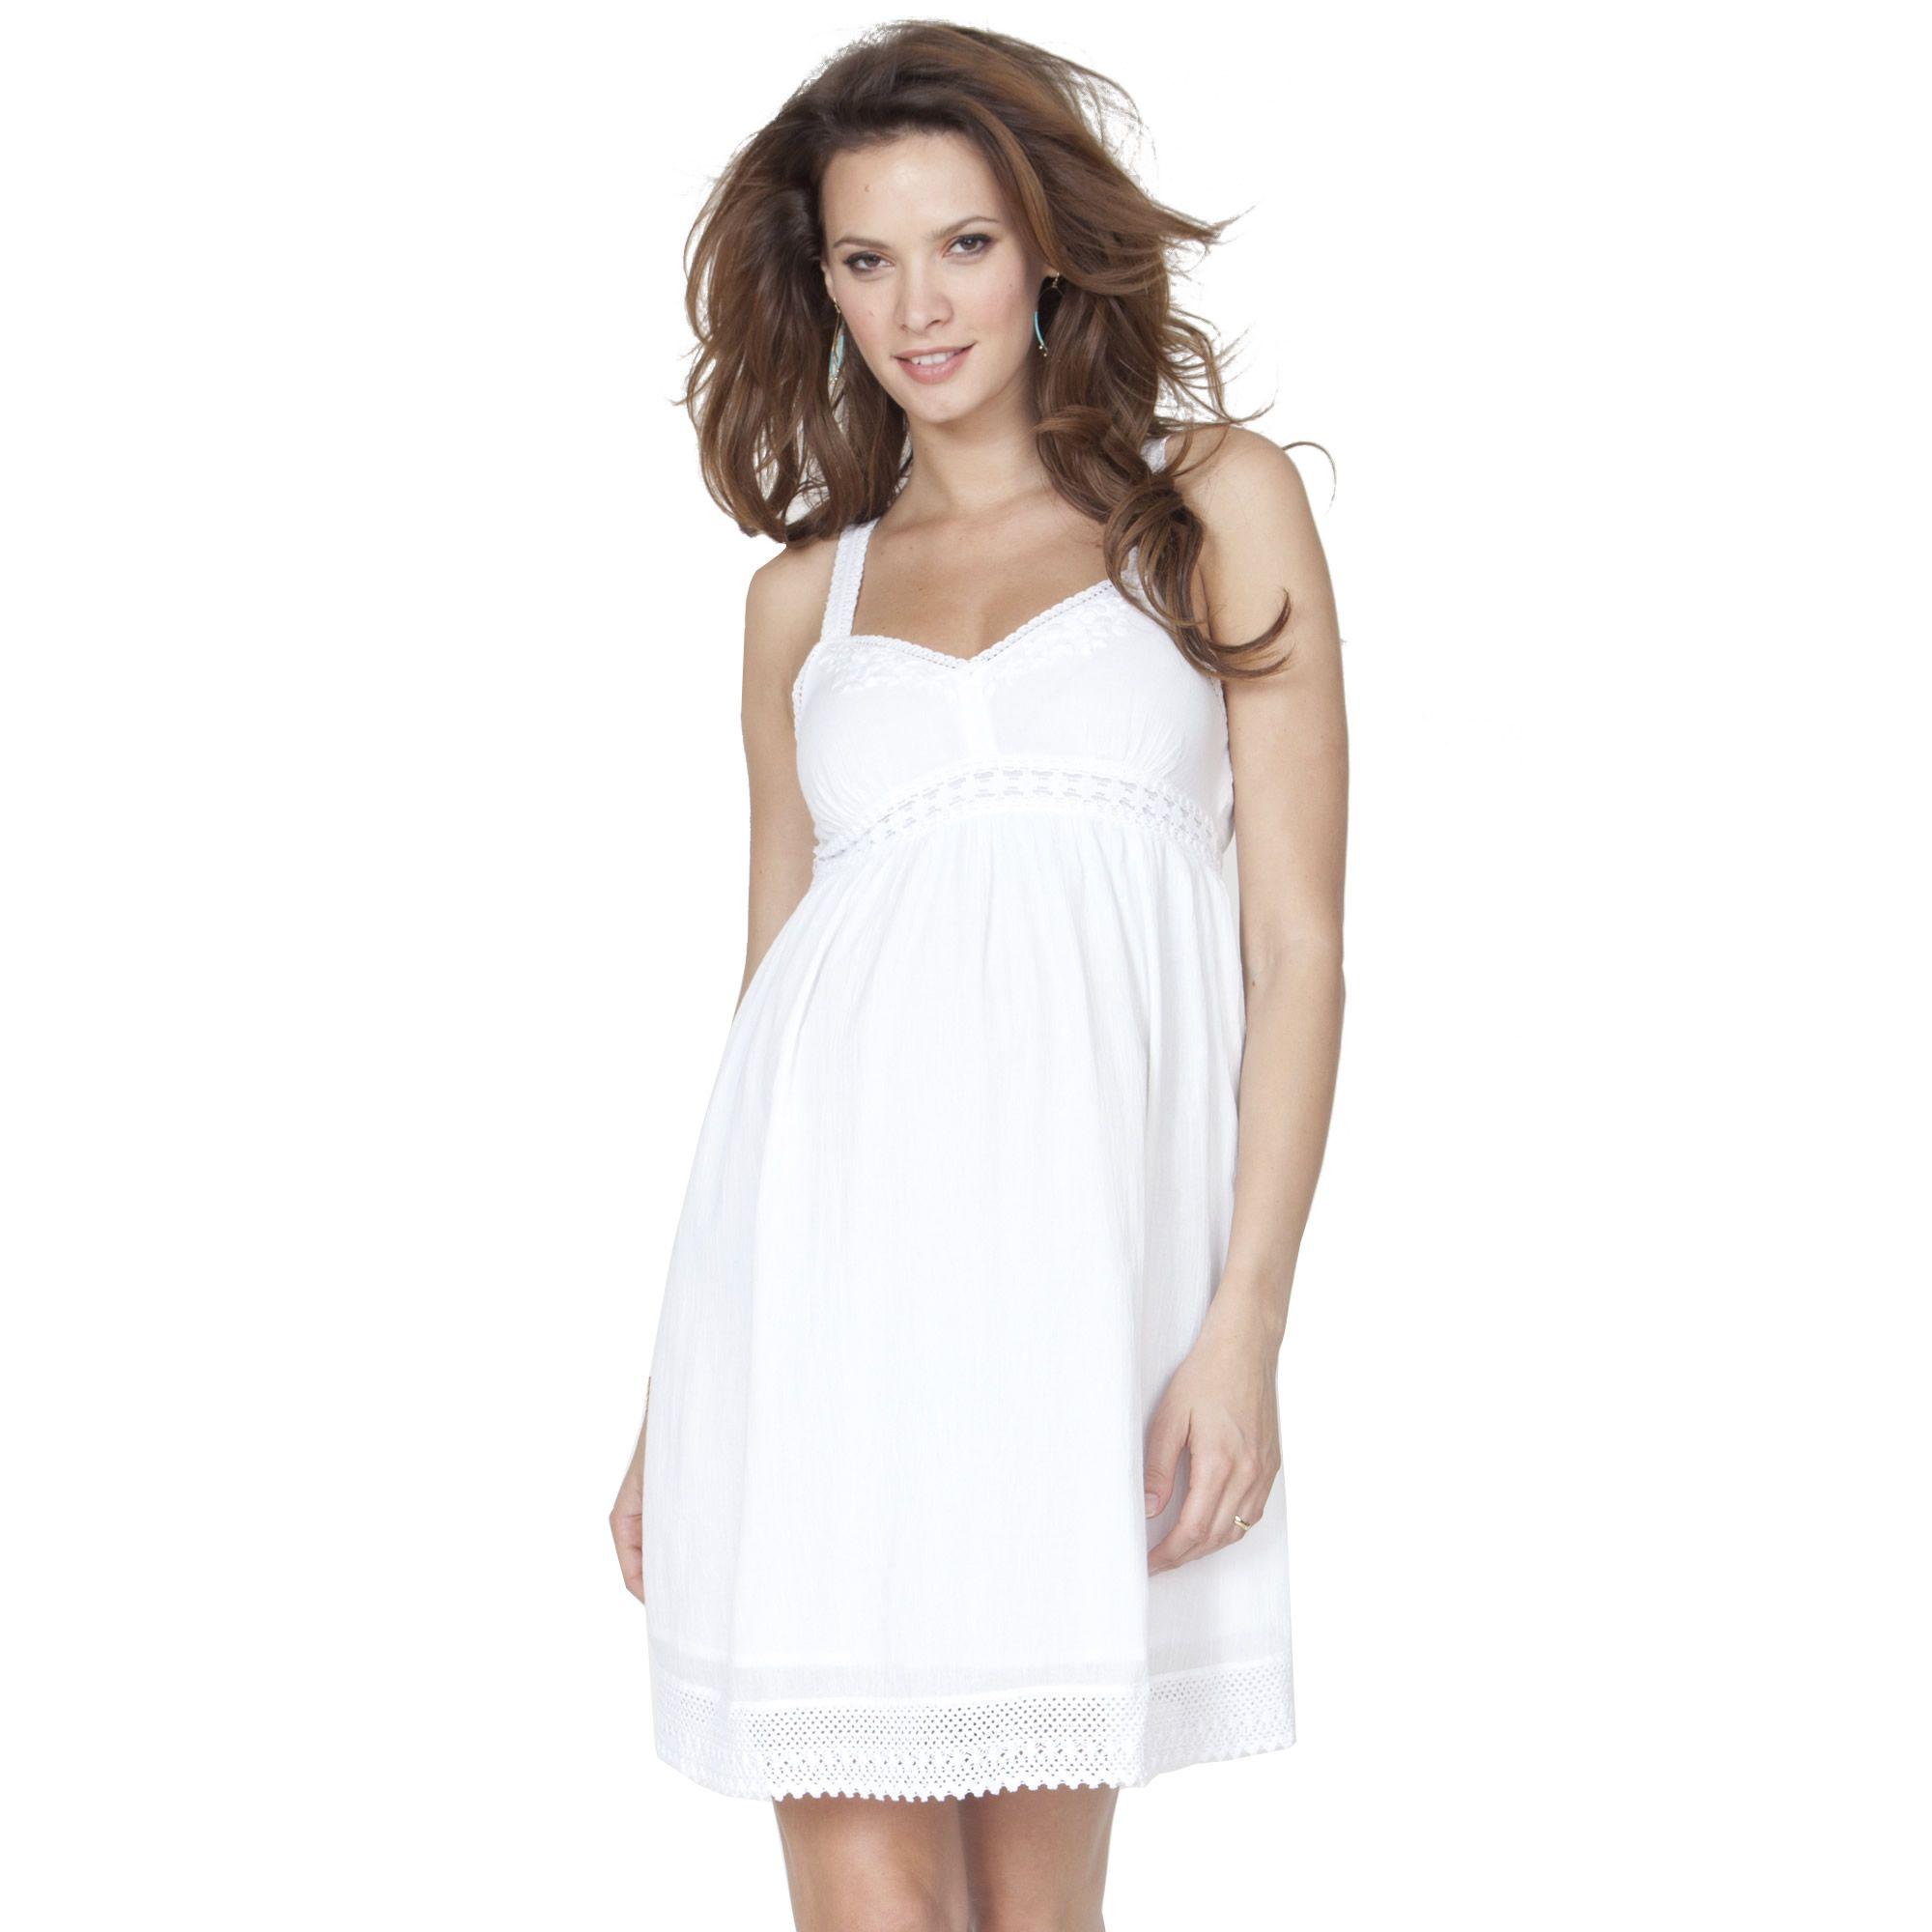 87ba2e98e6159 Baby Shower Dress - Seraphine White Jada Dress | Cute maternity ...